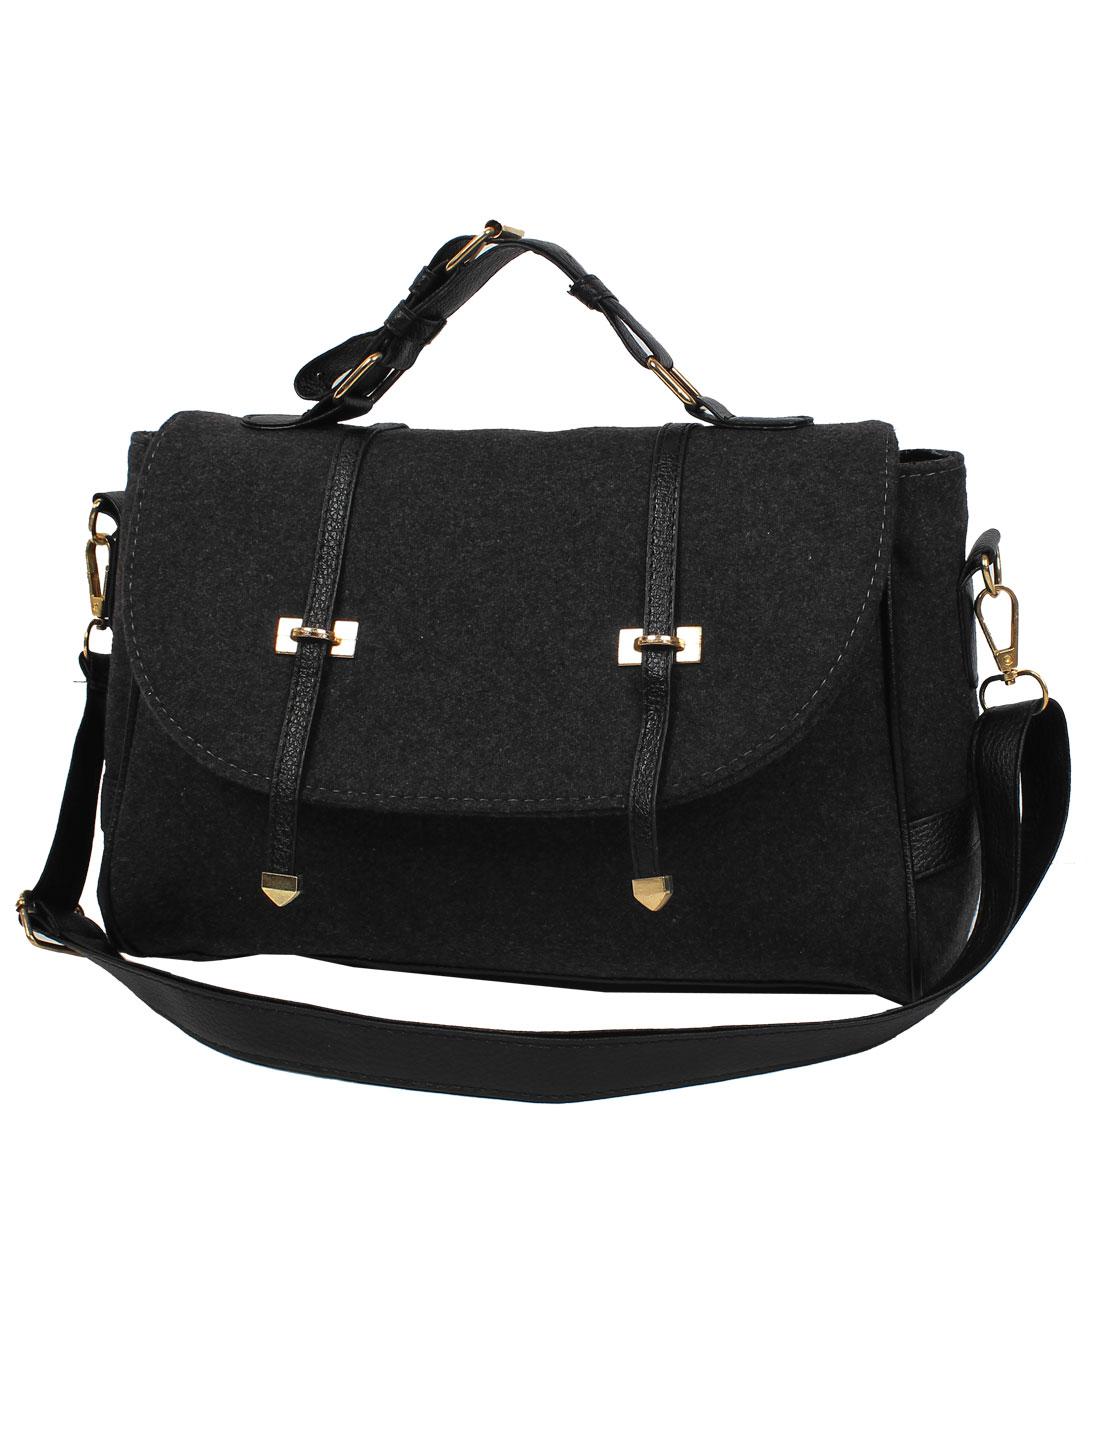 Fashion Nubuck Leather New Women Handbag Tote Shoulder Messenger Hobo Bag Black